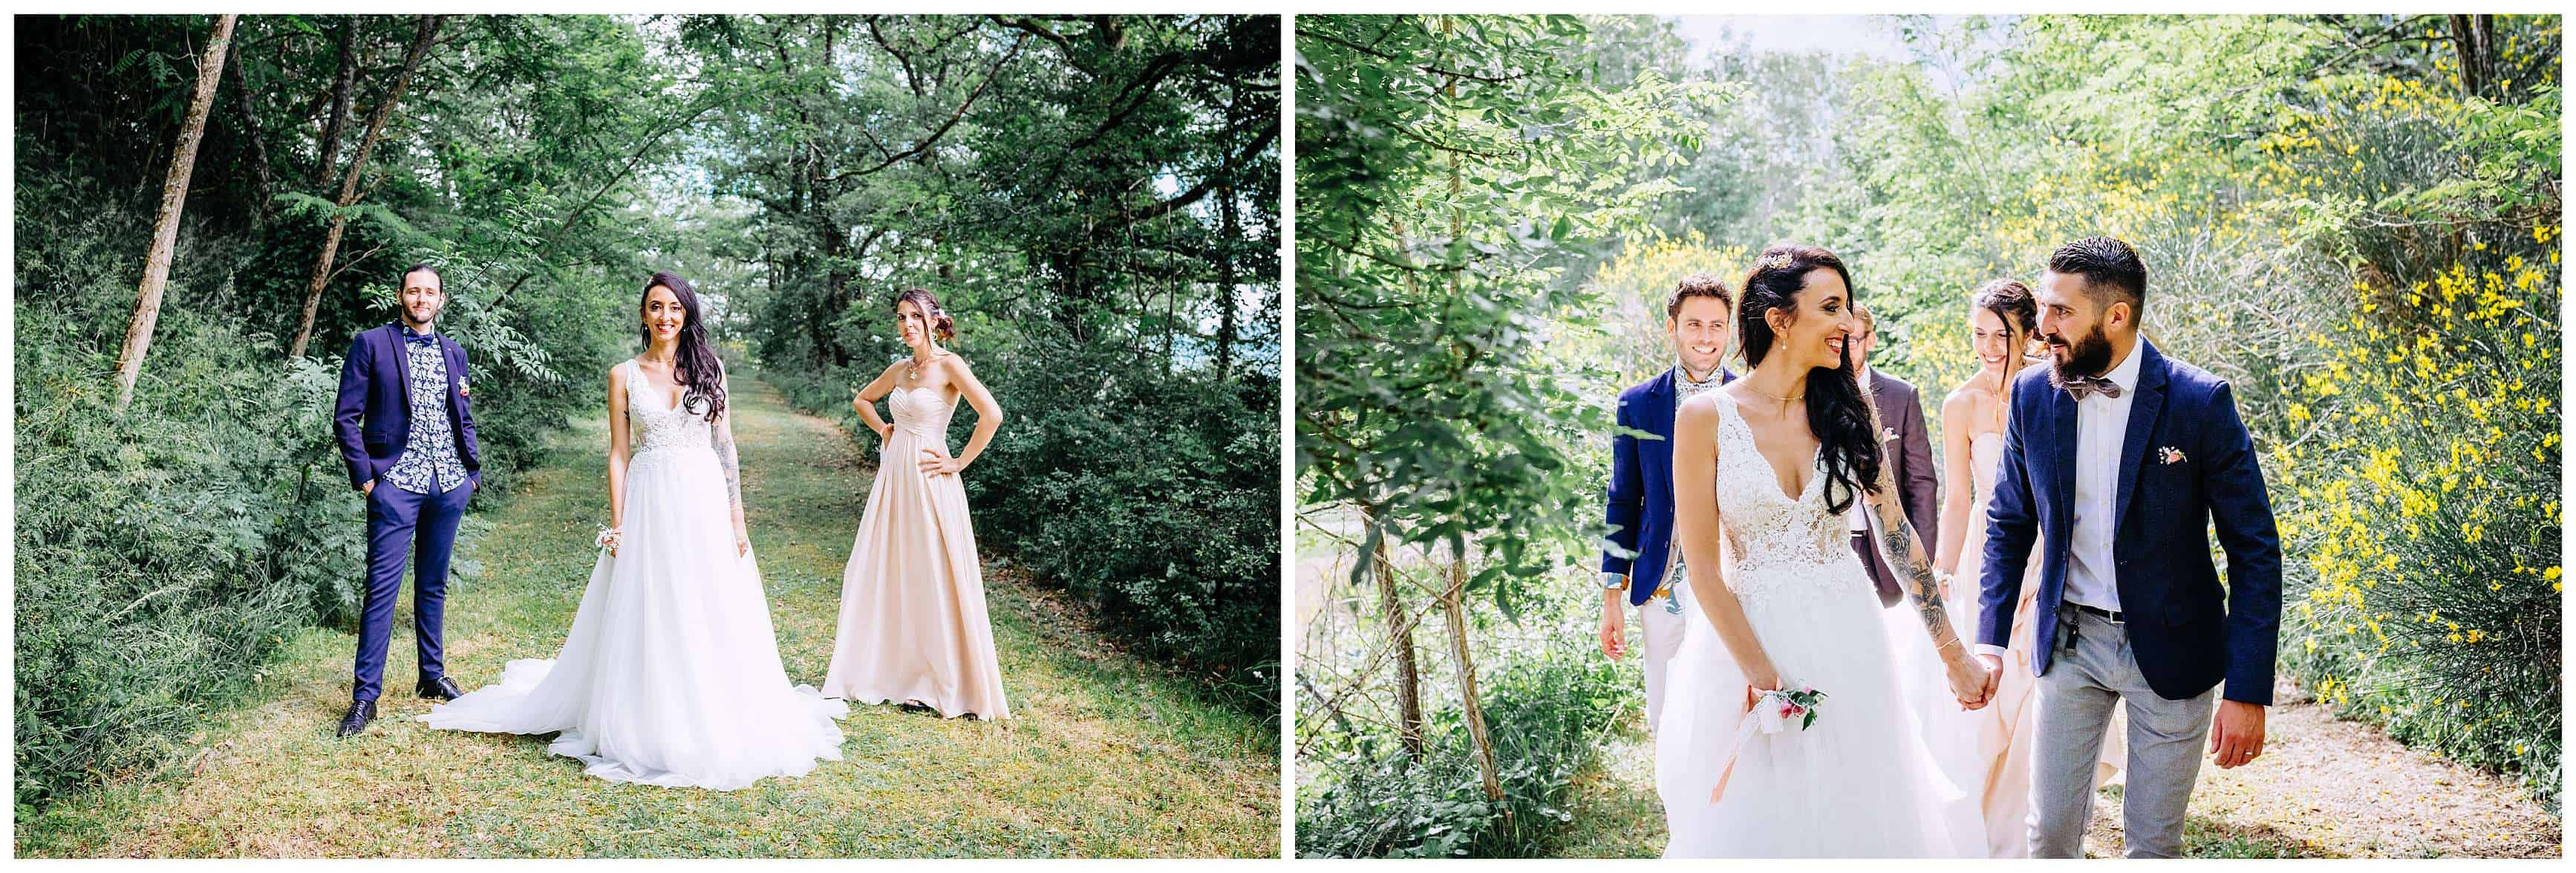 photographe temoins mariage